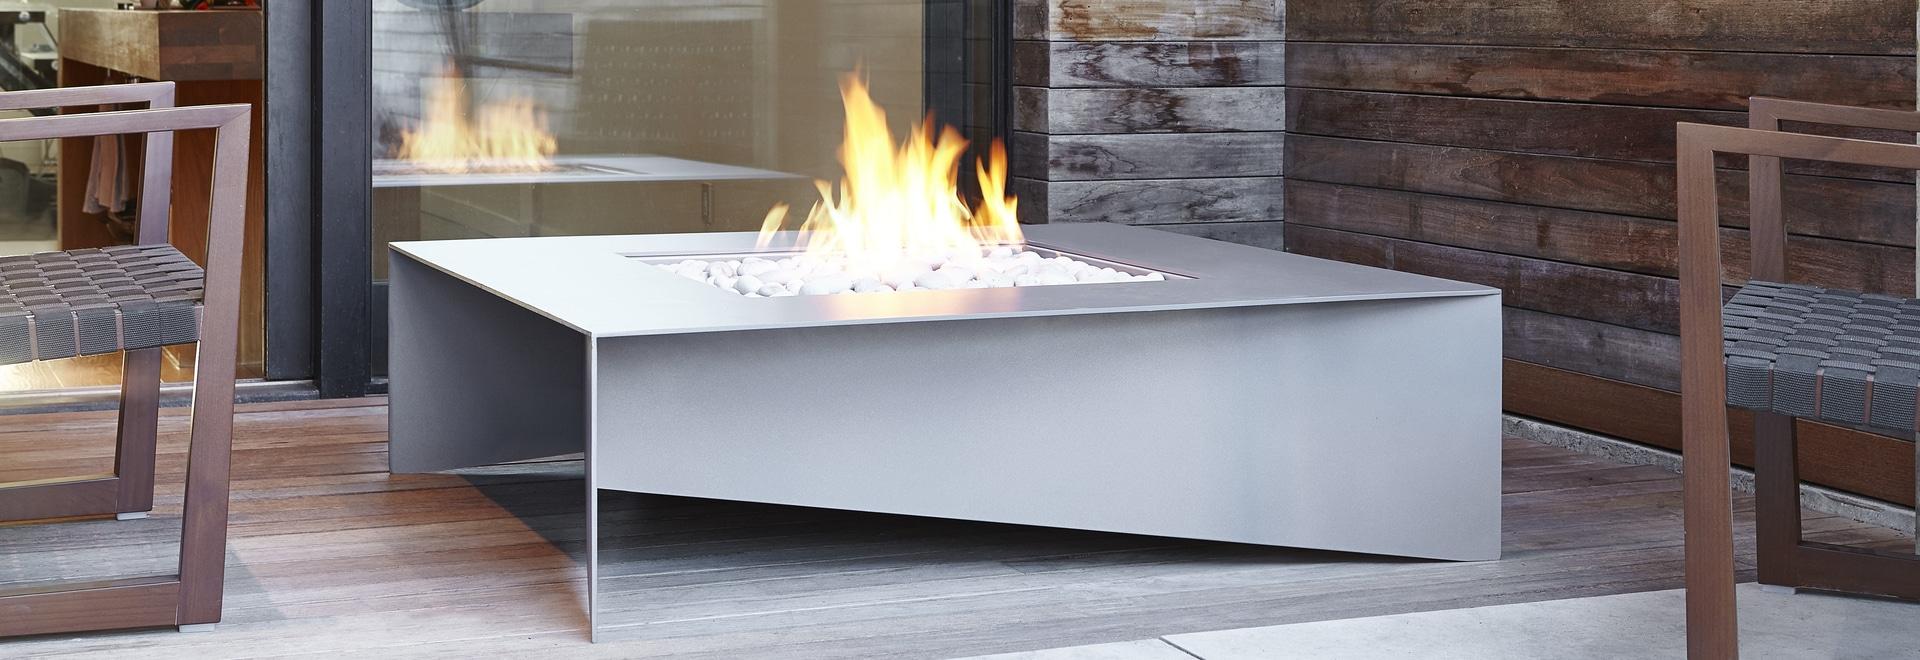 Fold modern fire table